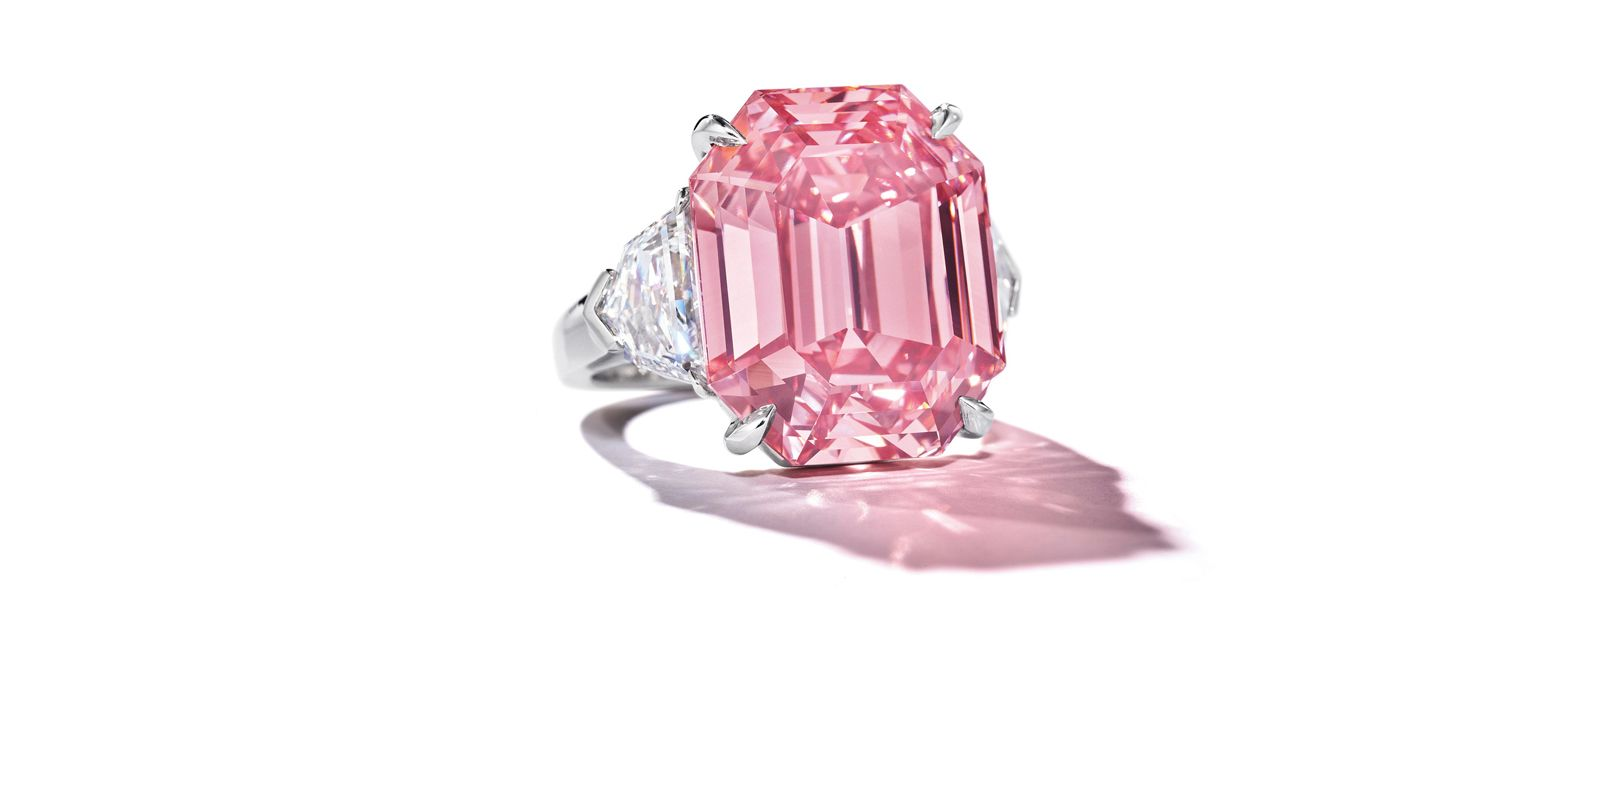 HARRY WINSTON收購18.96克拉Fancy Vivid Pink鑽石,續寫鑽石傳奇篇章